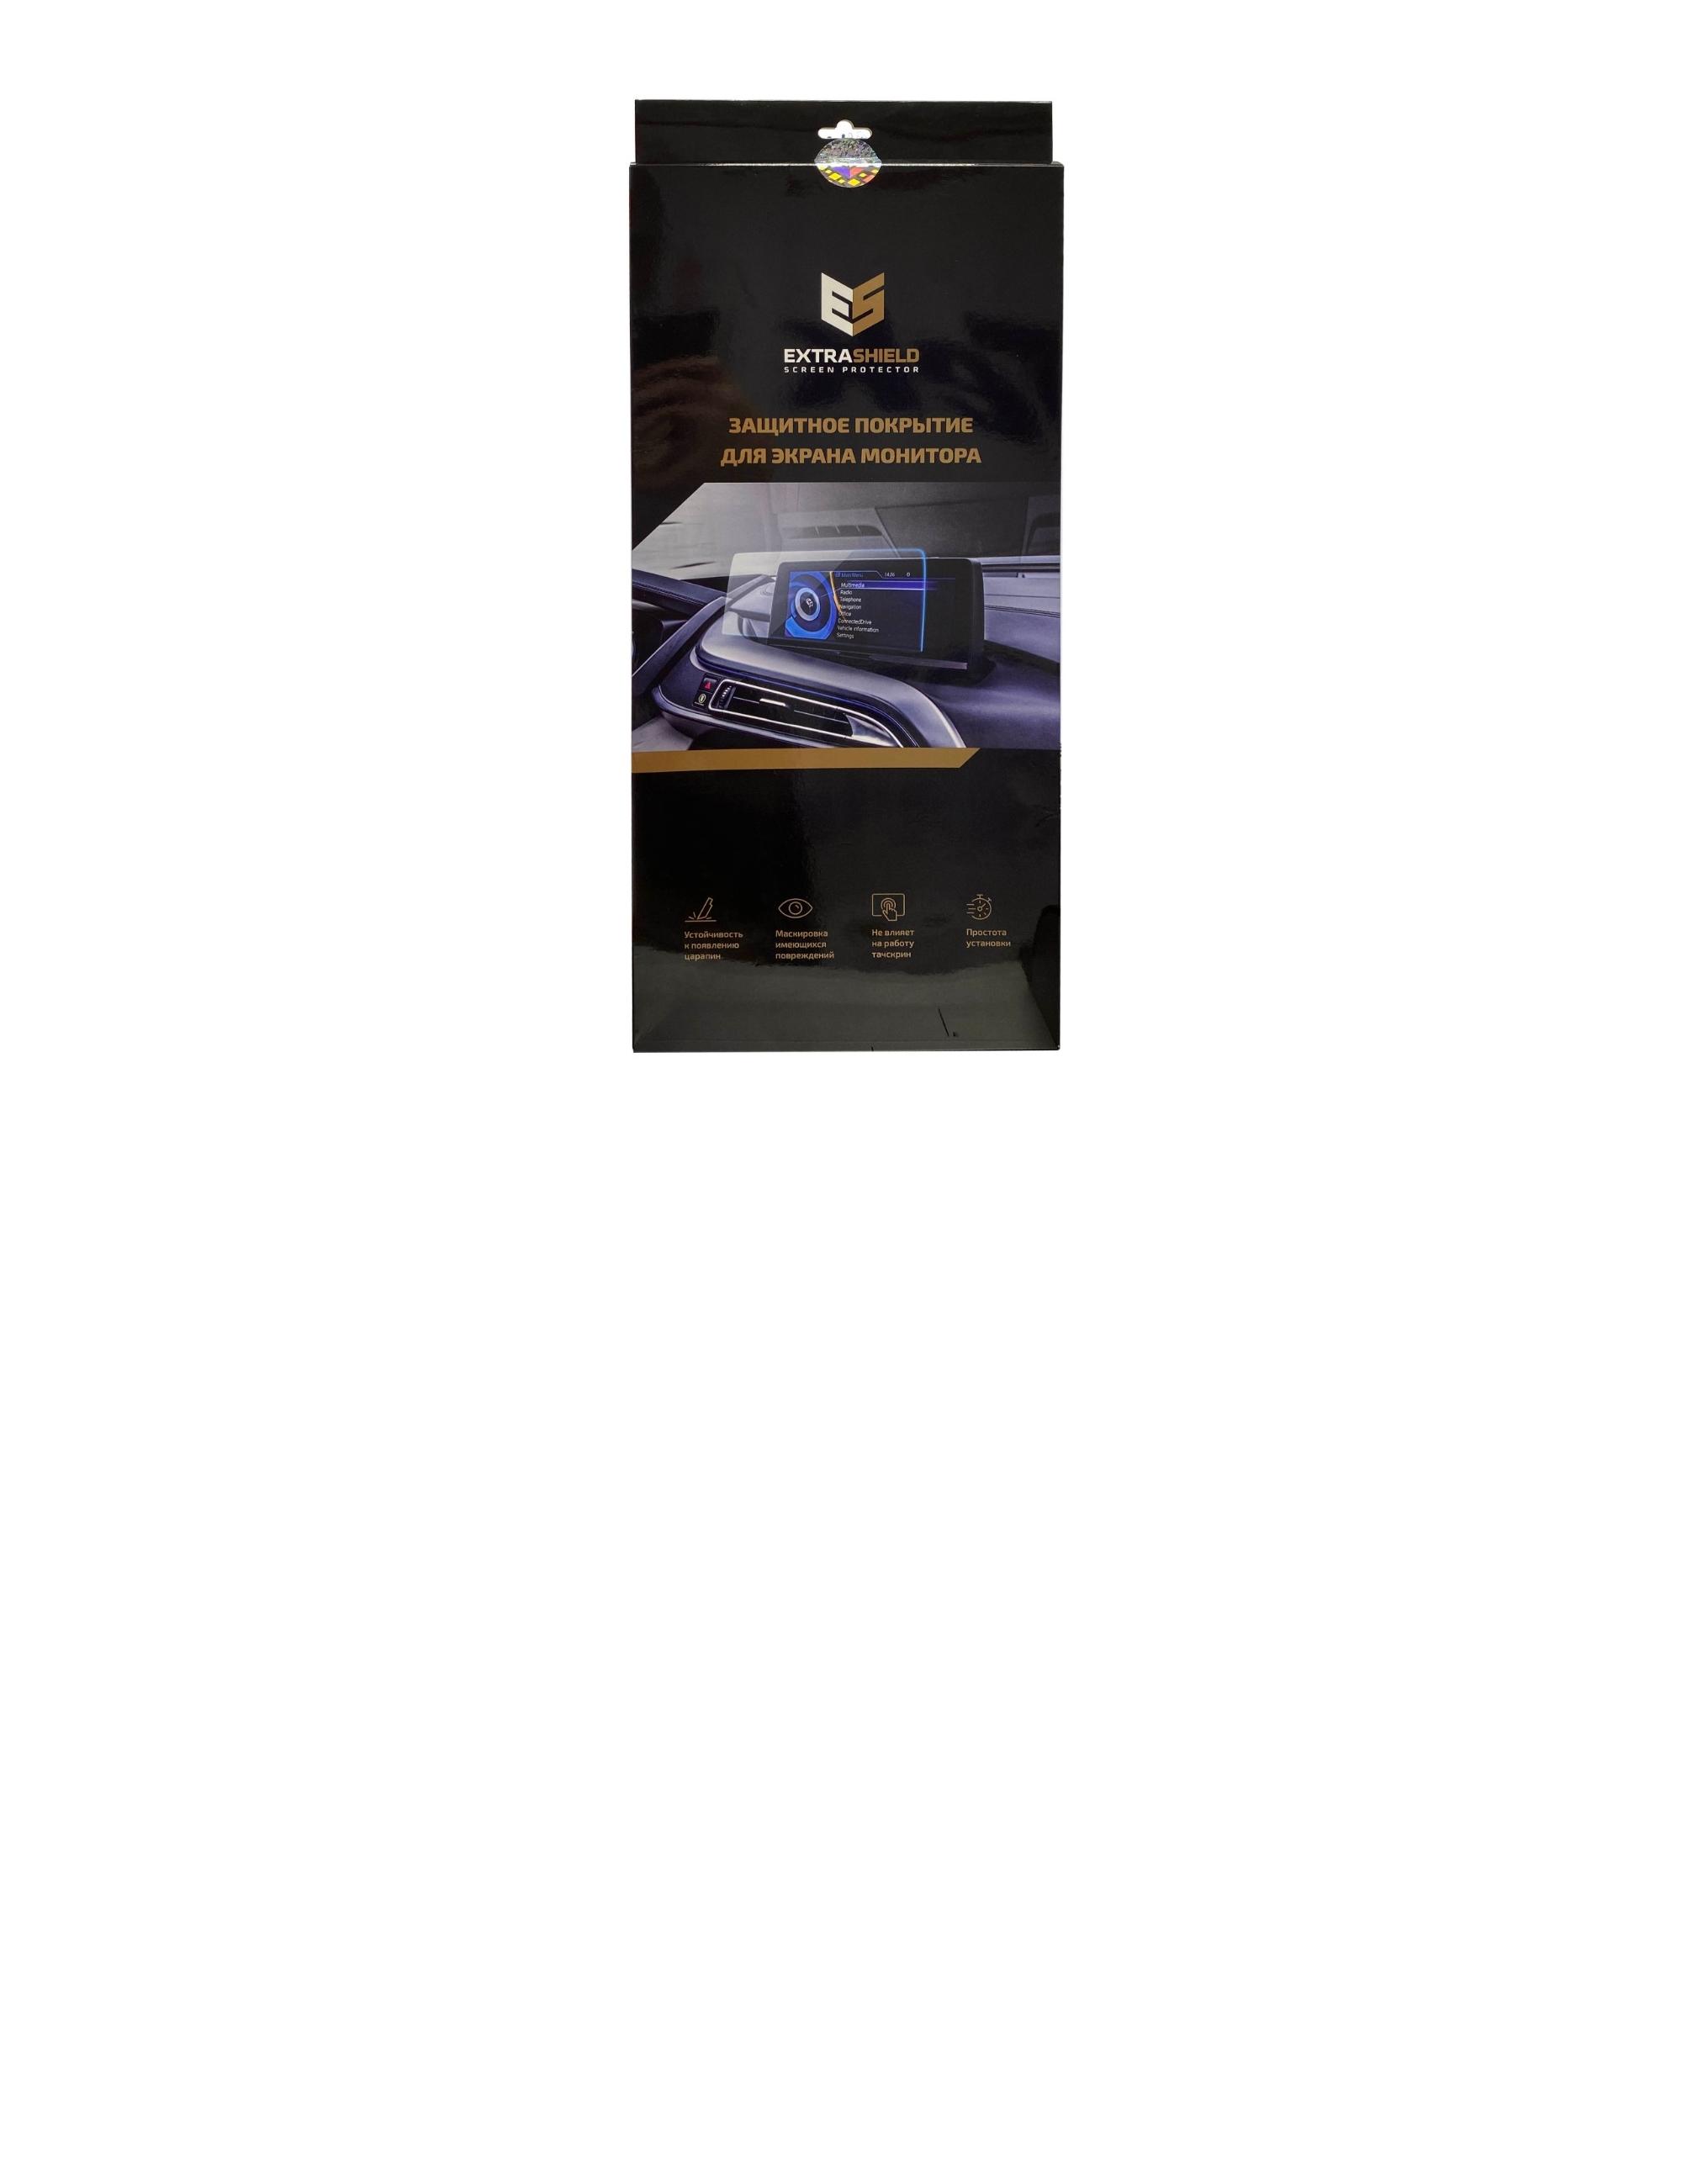 BMW Х5 (F15) 2013 - 2018 мультимедиа 10.2 Защитное стекло Матовая